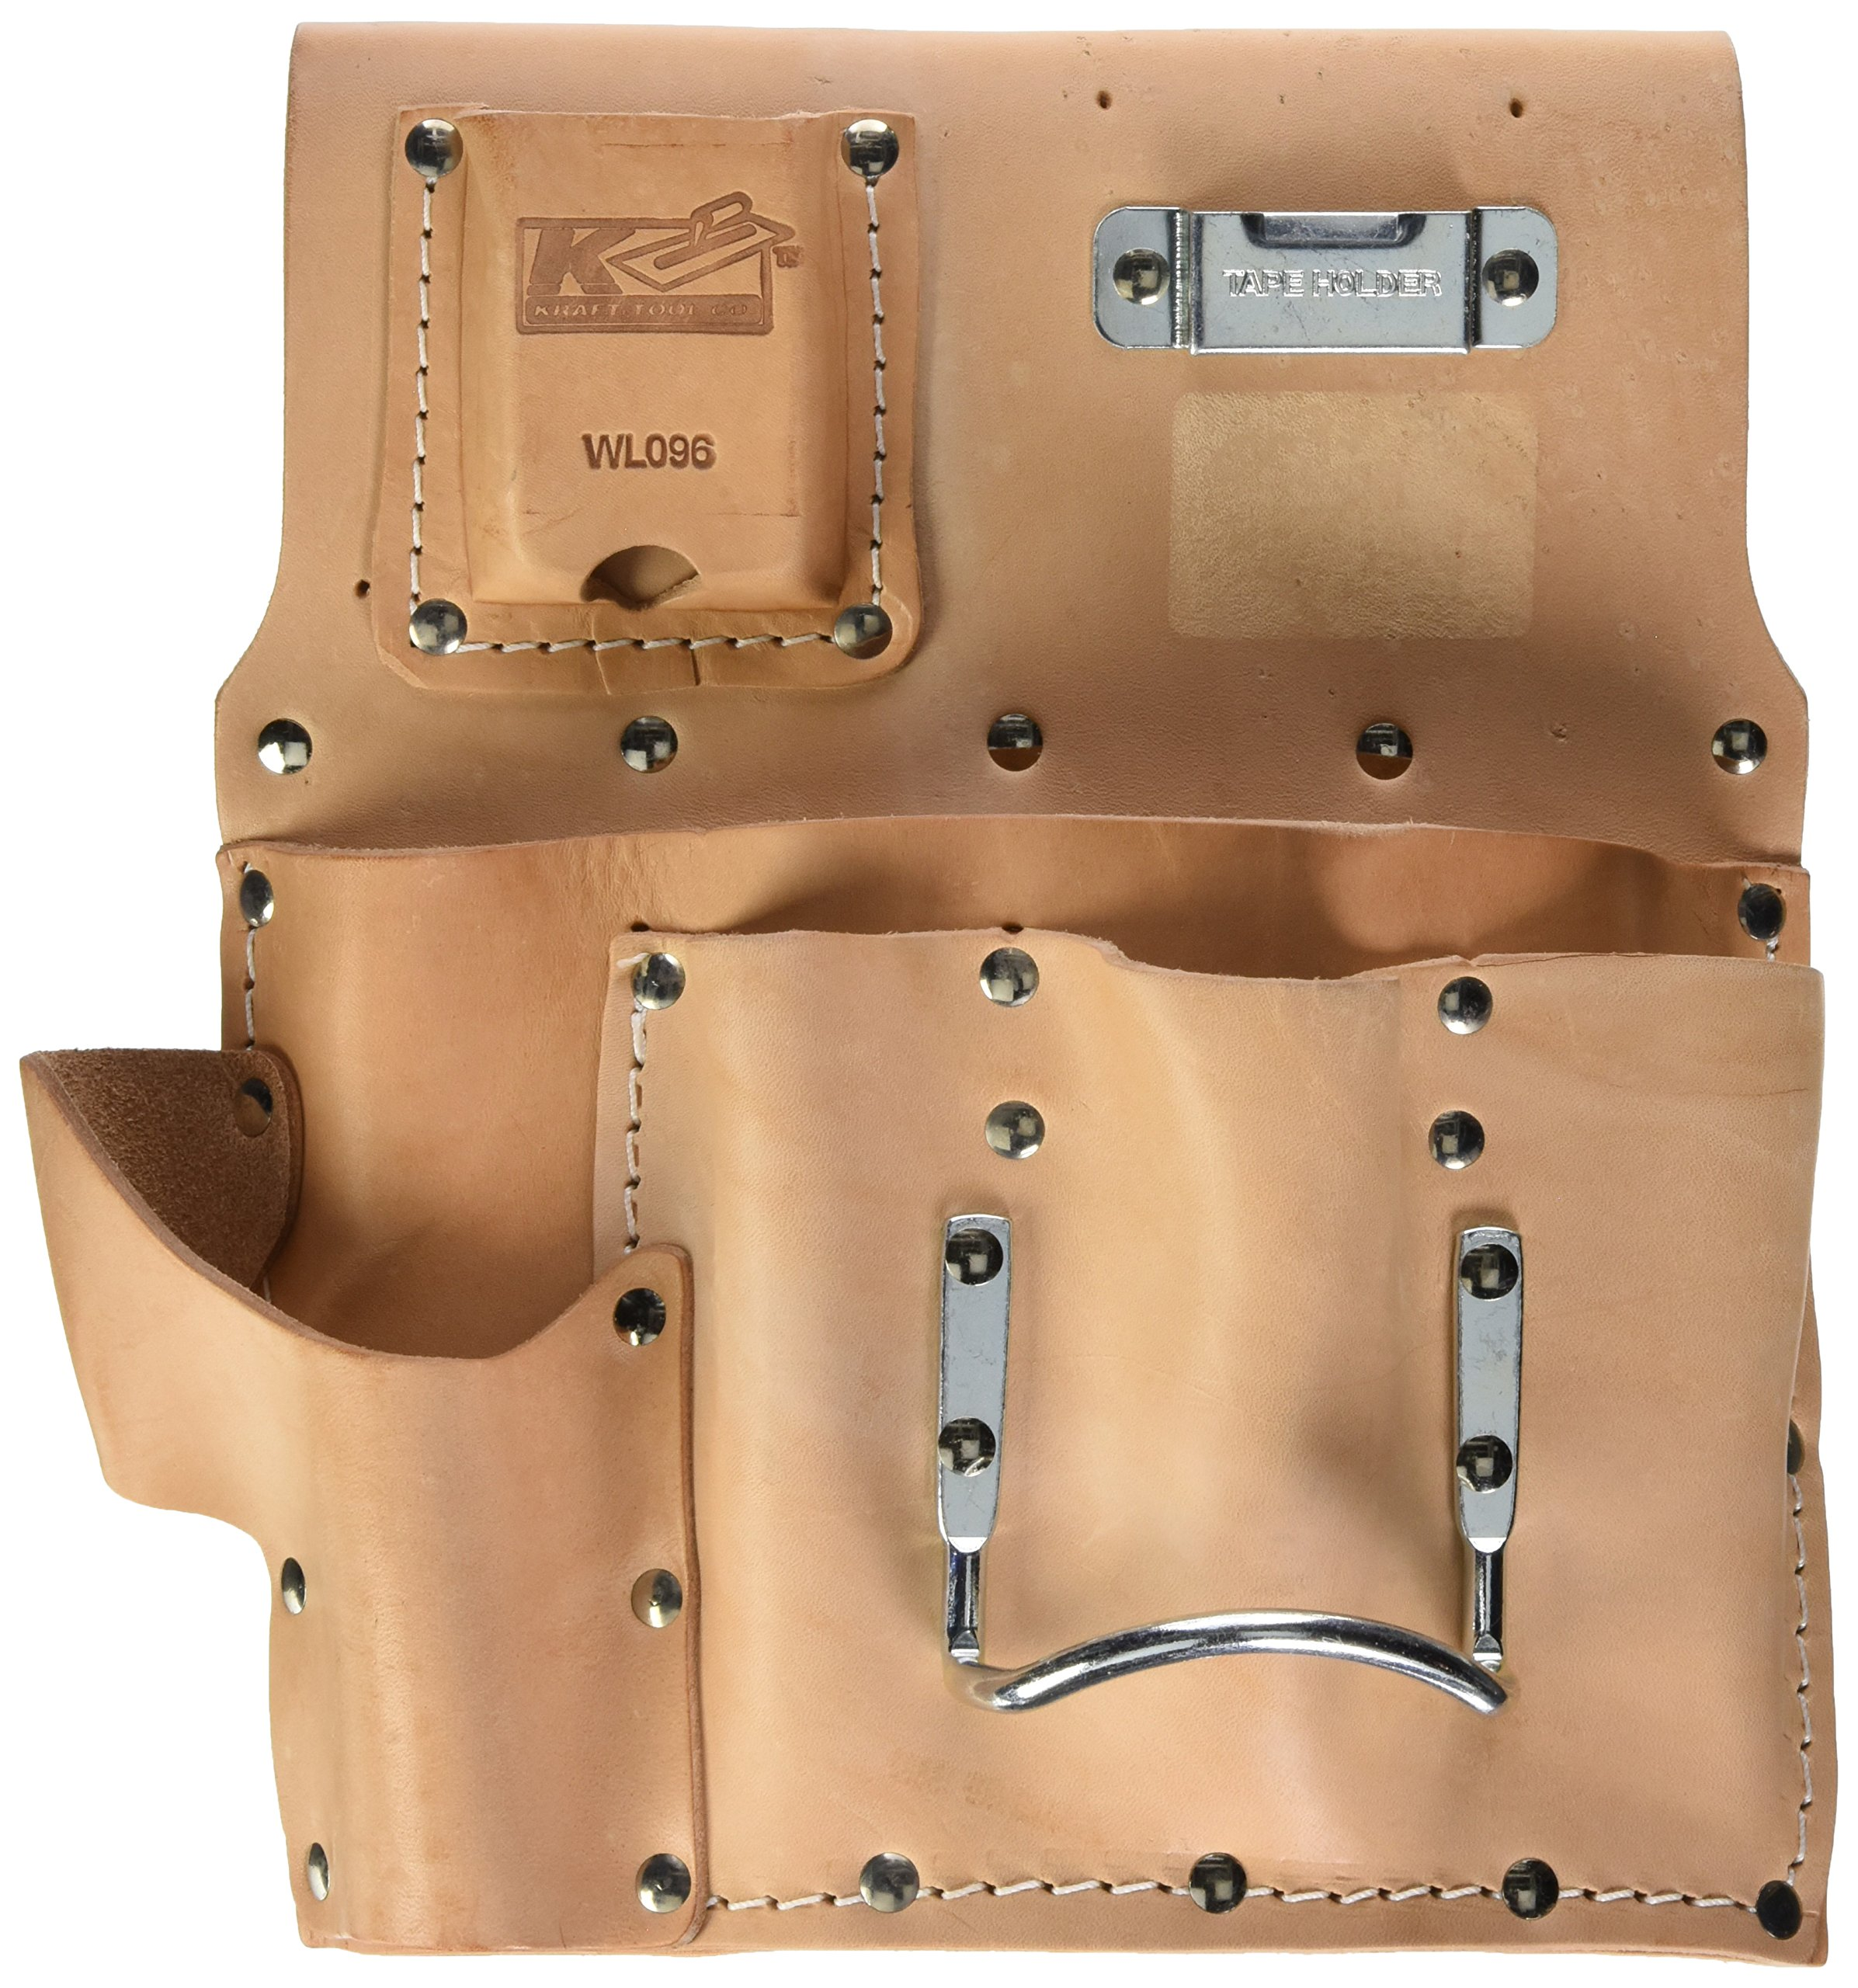 Kraft Tool WL096 Flat Type Drywall Tool Pouch